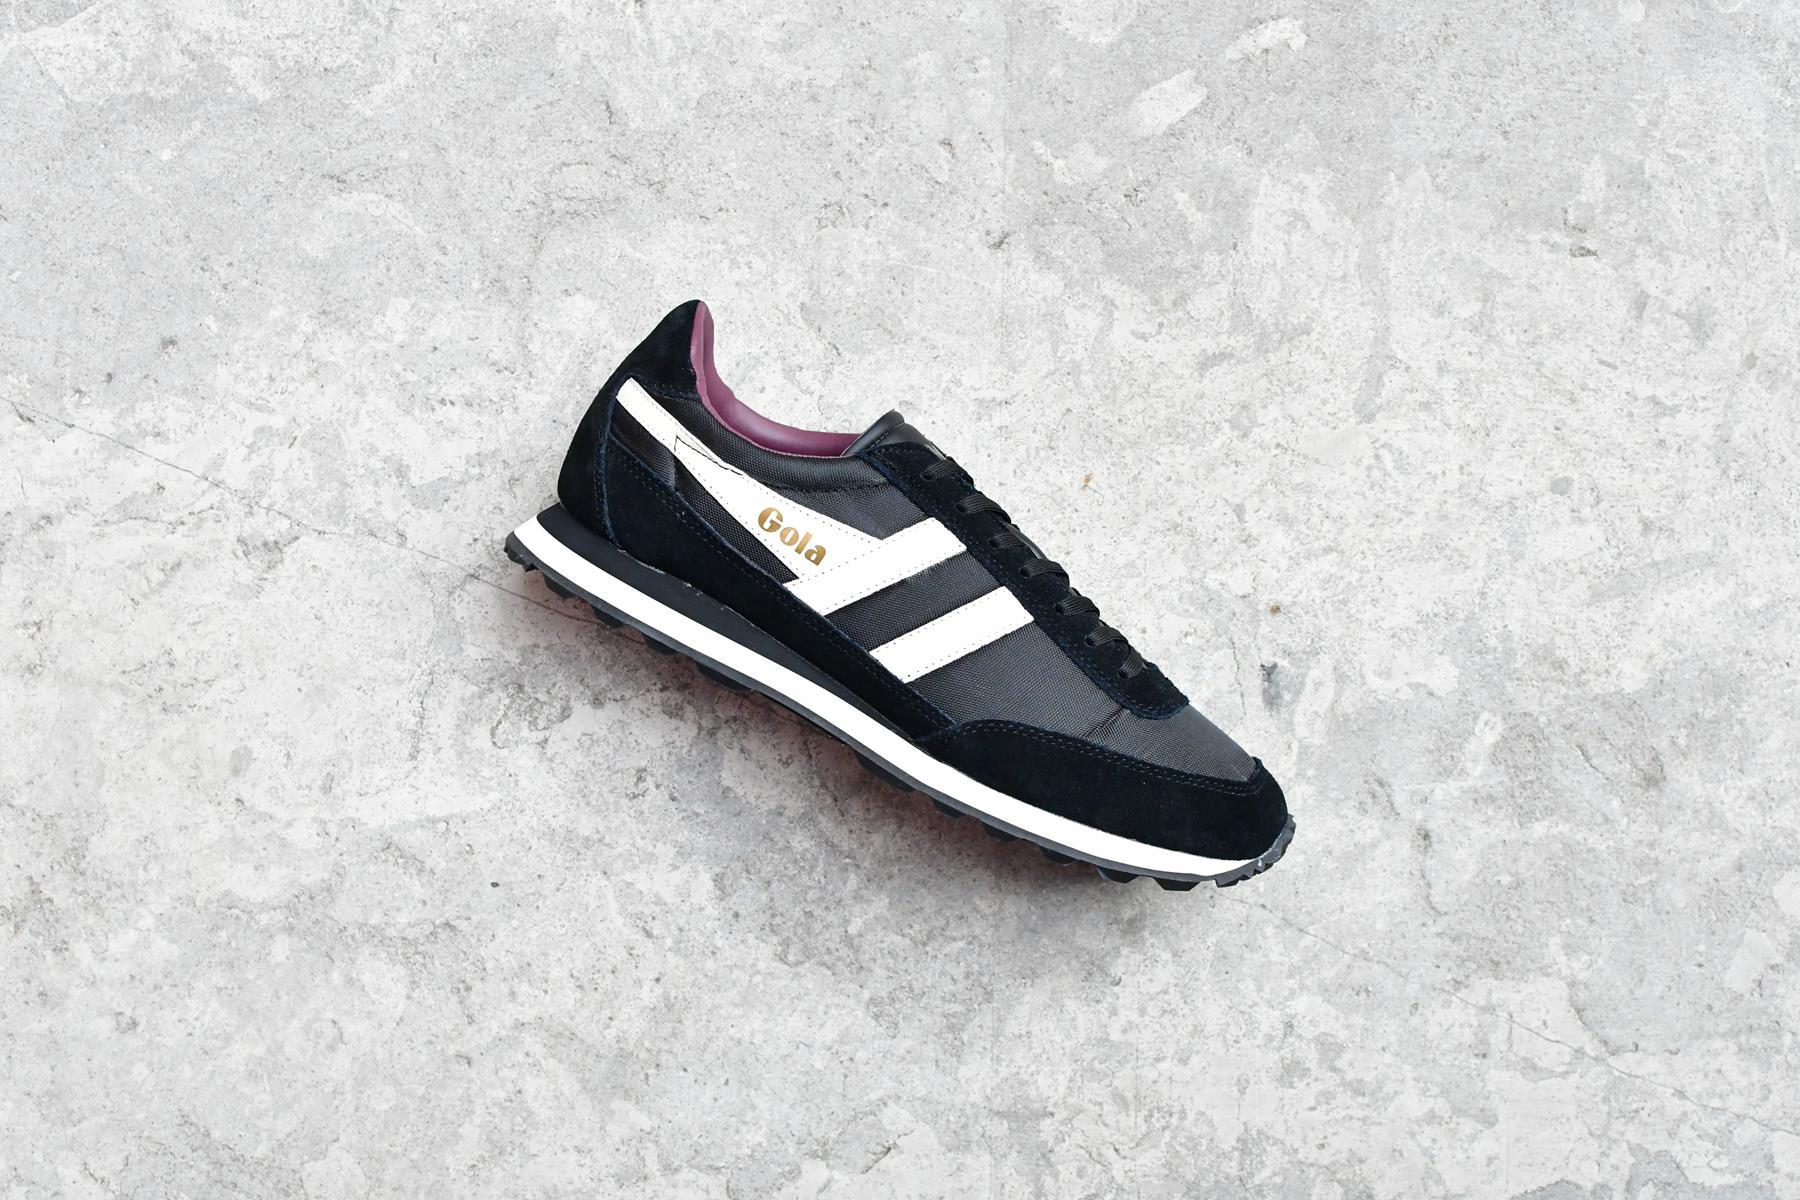 CMA597_AmorShoes-Gola-Flyer-Black-Off-White-Burgundy-zapatilla-nylon-negro-piel-vuelta-negra-logo-blanco-roto-crudo-CMA597